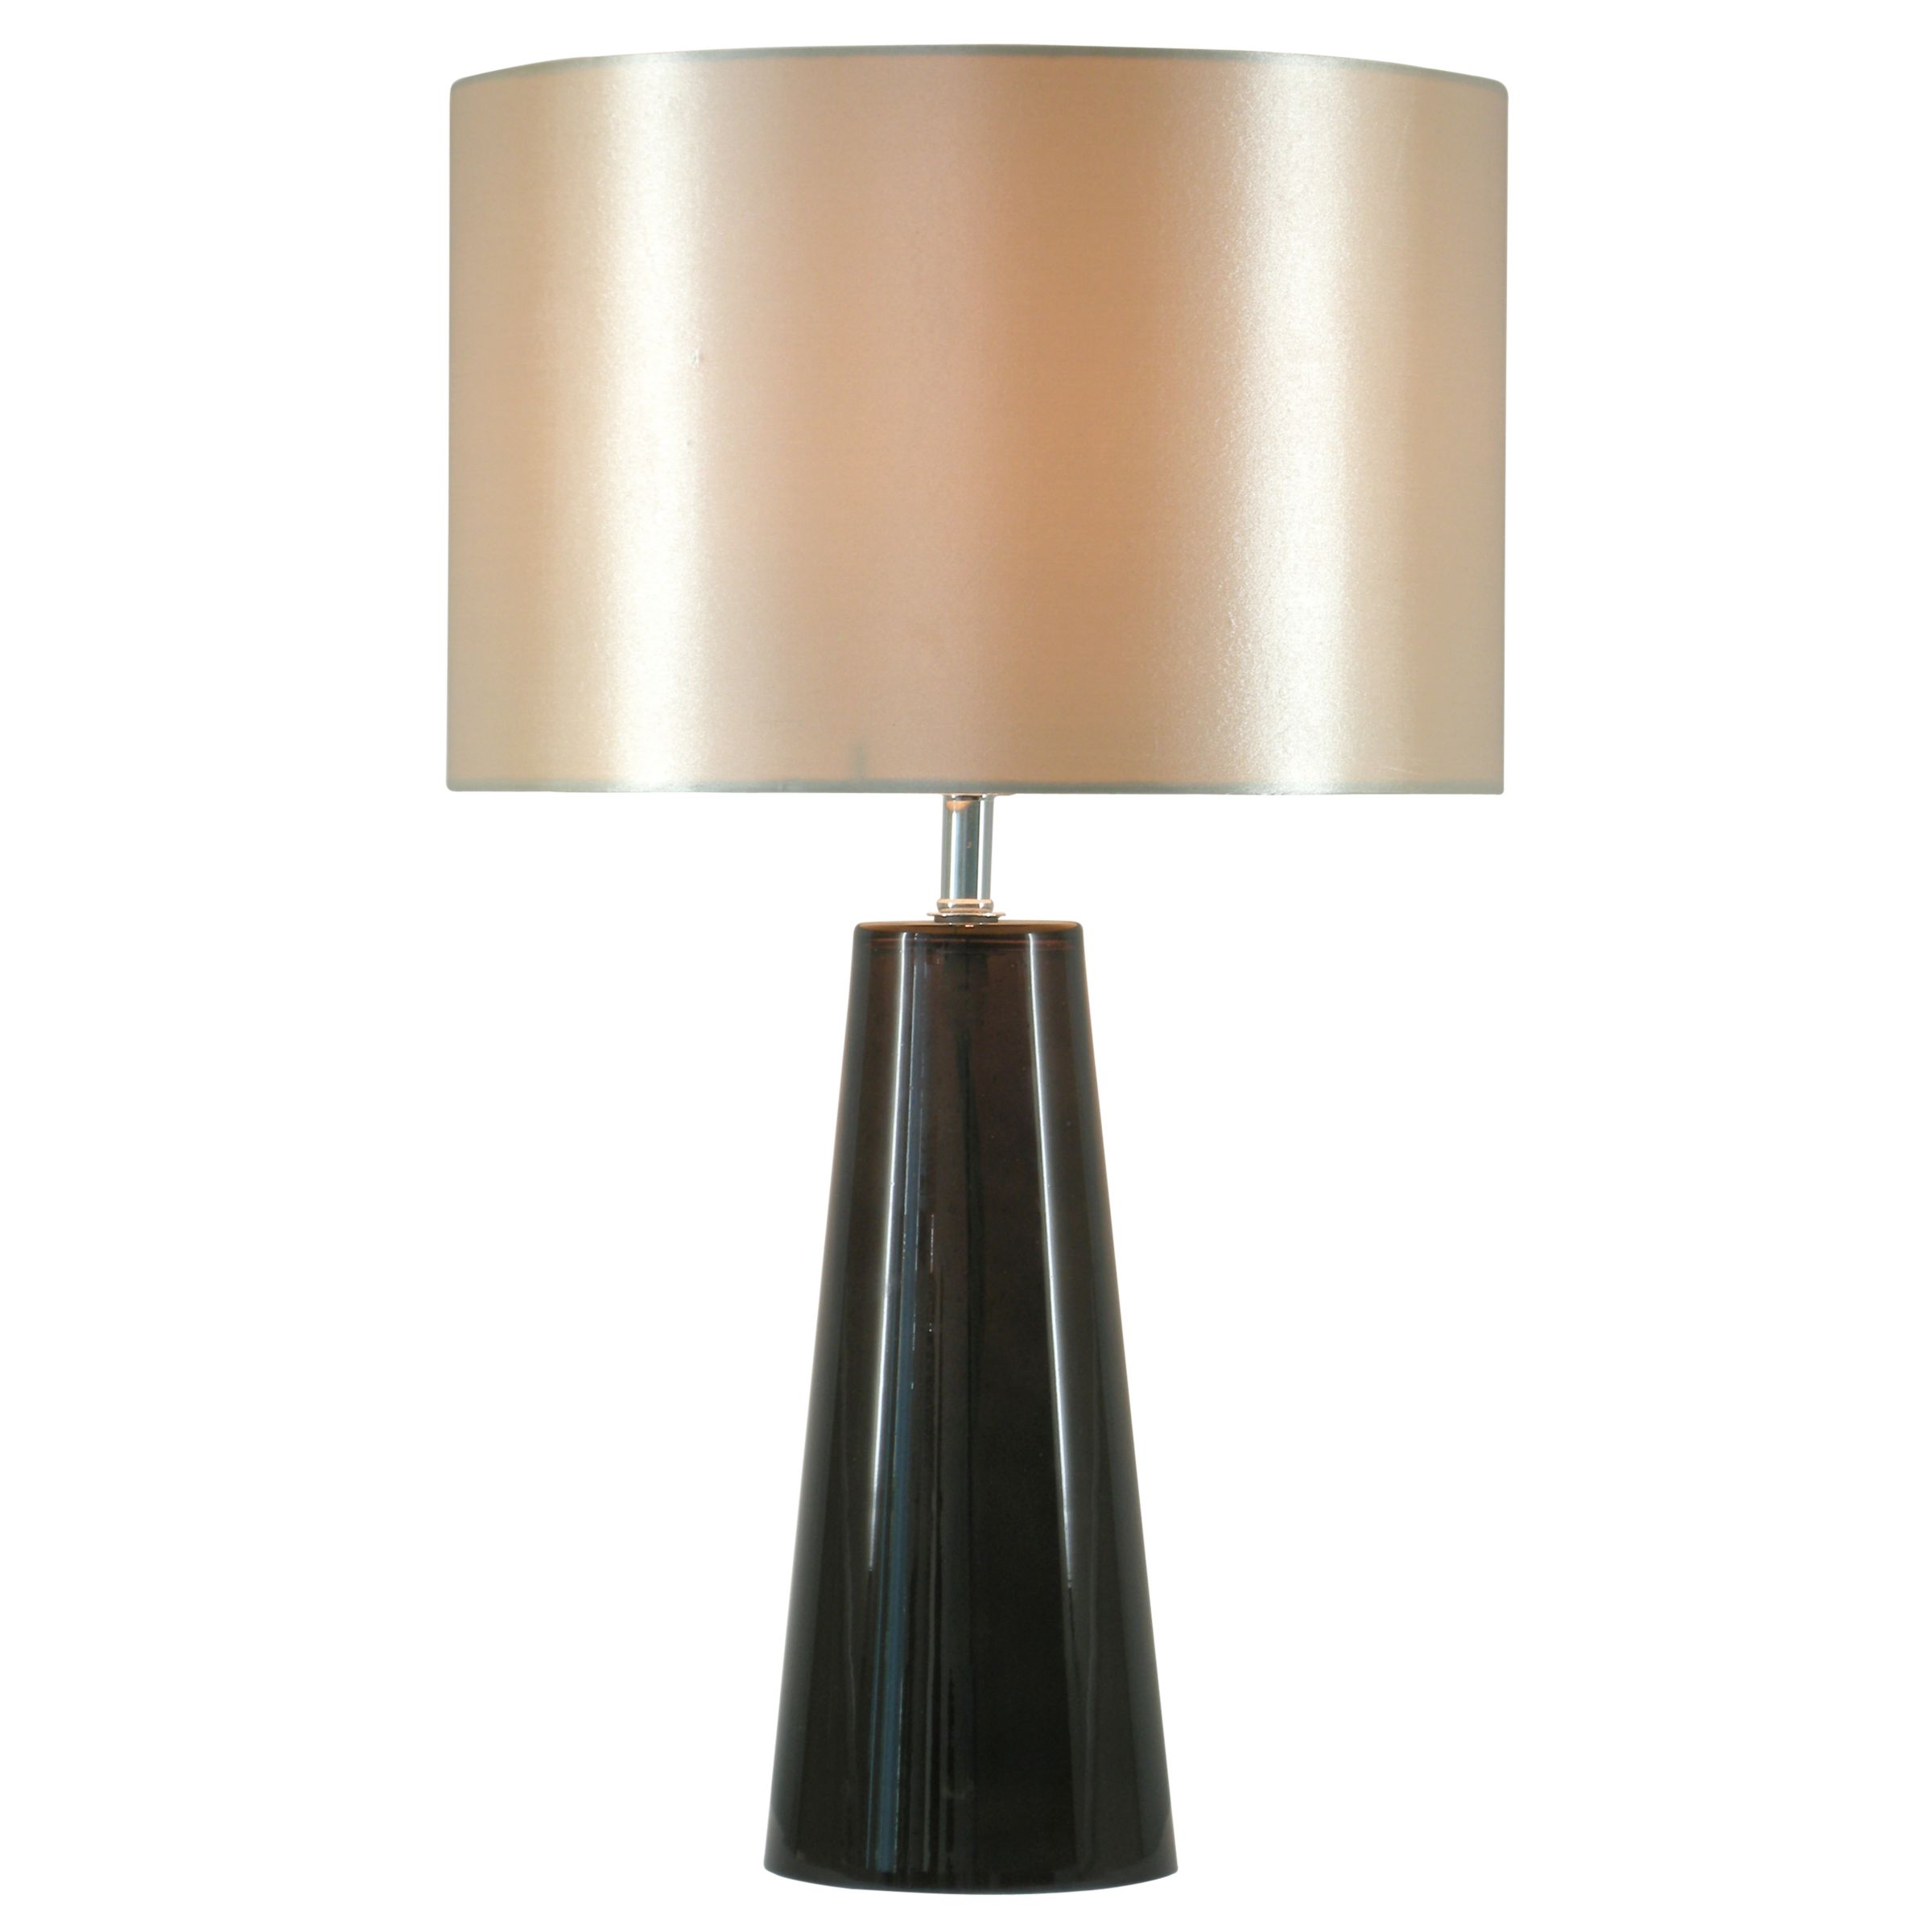 John Lewis Olivia Table Lamp, Graphite